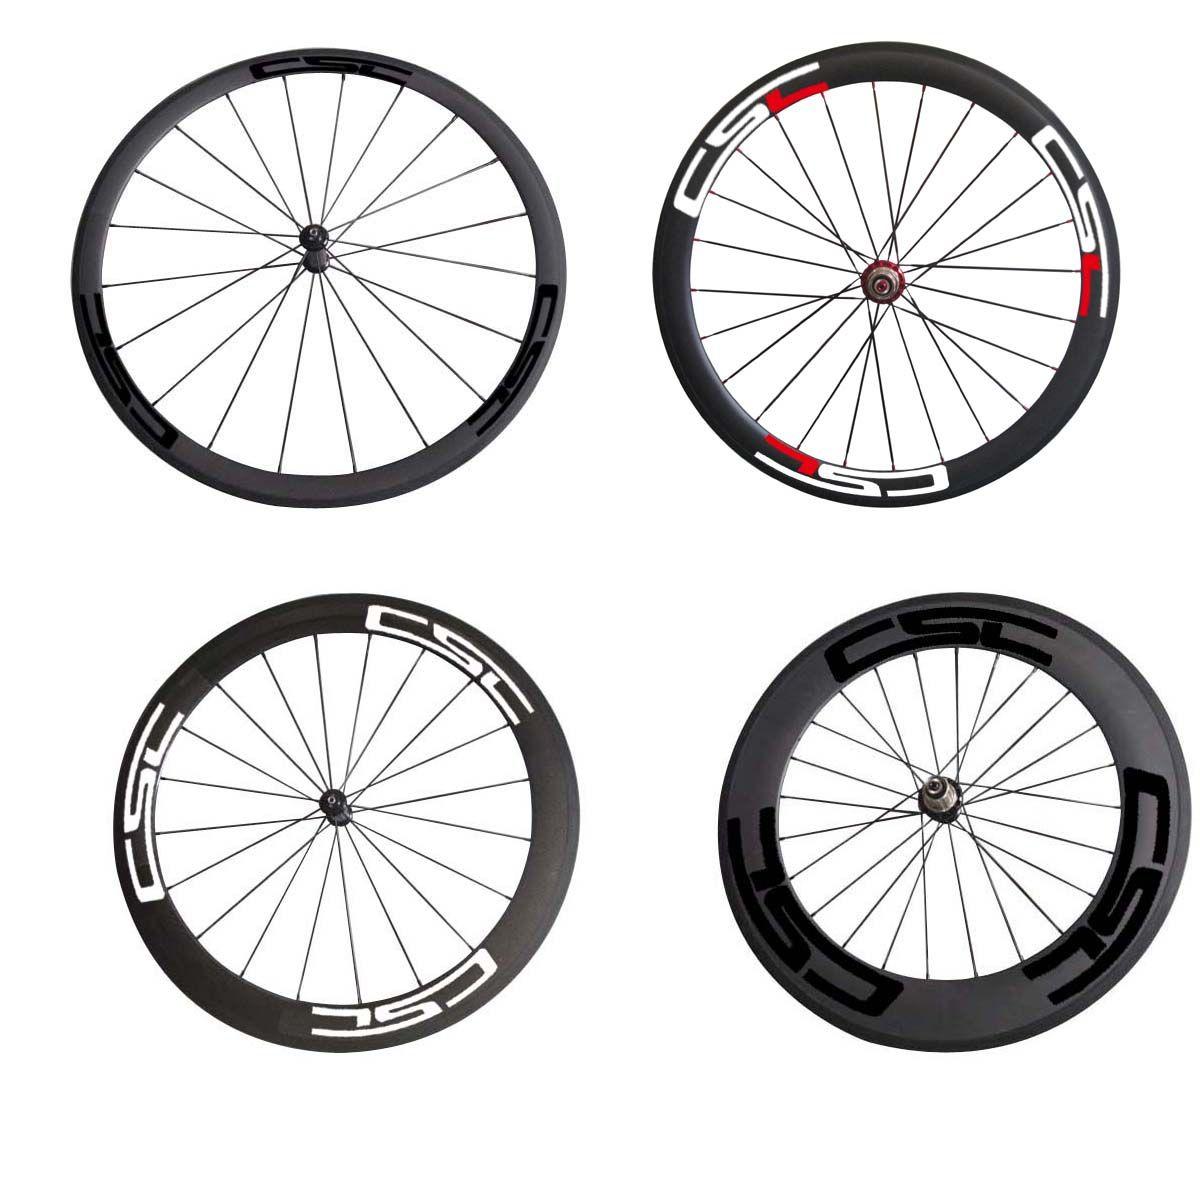 Full Carbon Wheels Straight Pull 24mm 38mm 50mm 60mm 88mm Clincher Tubular  Road Bike Bicycle Wheels Powerway R36 Hub Road Bike Wheelset